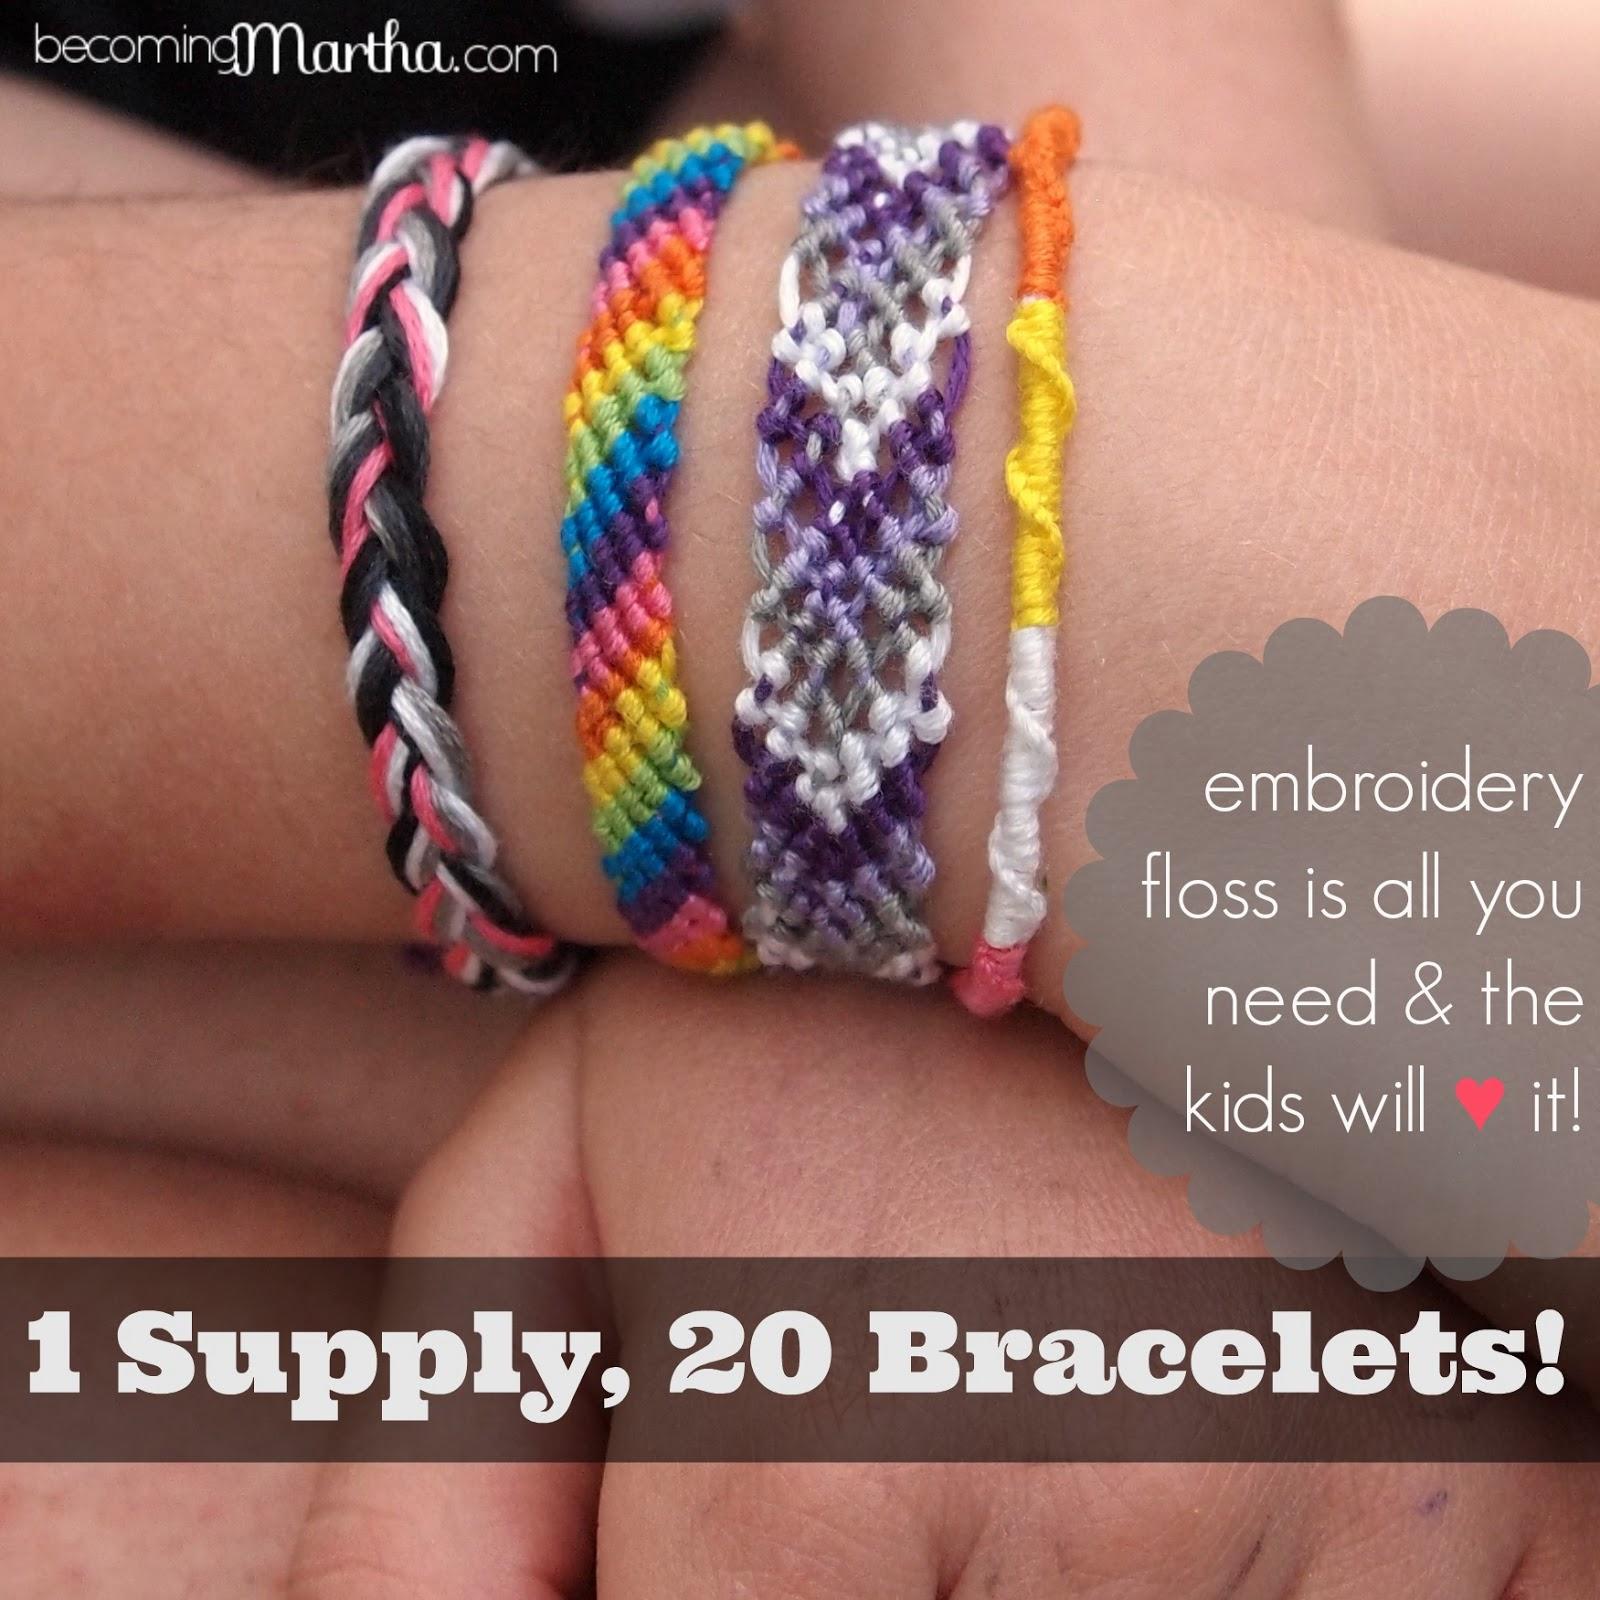 Friendship bracelet embroidery floss bracelet